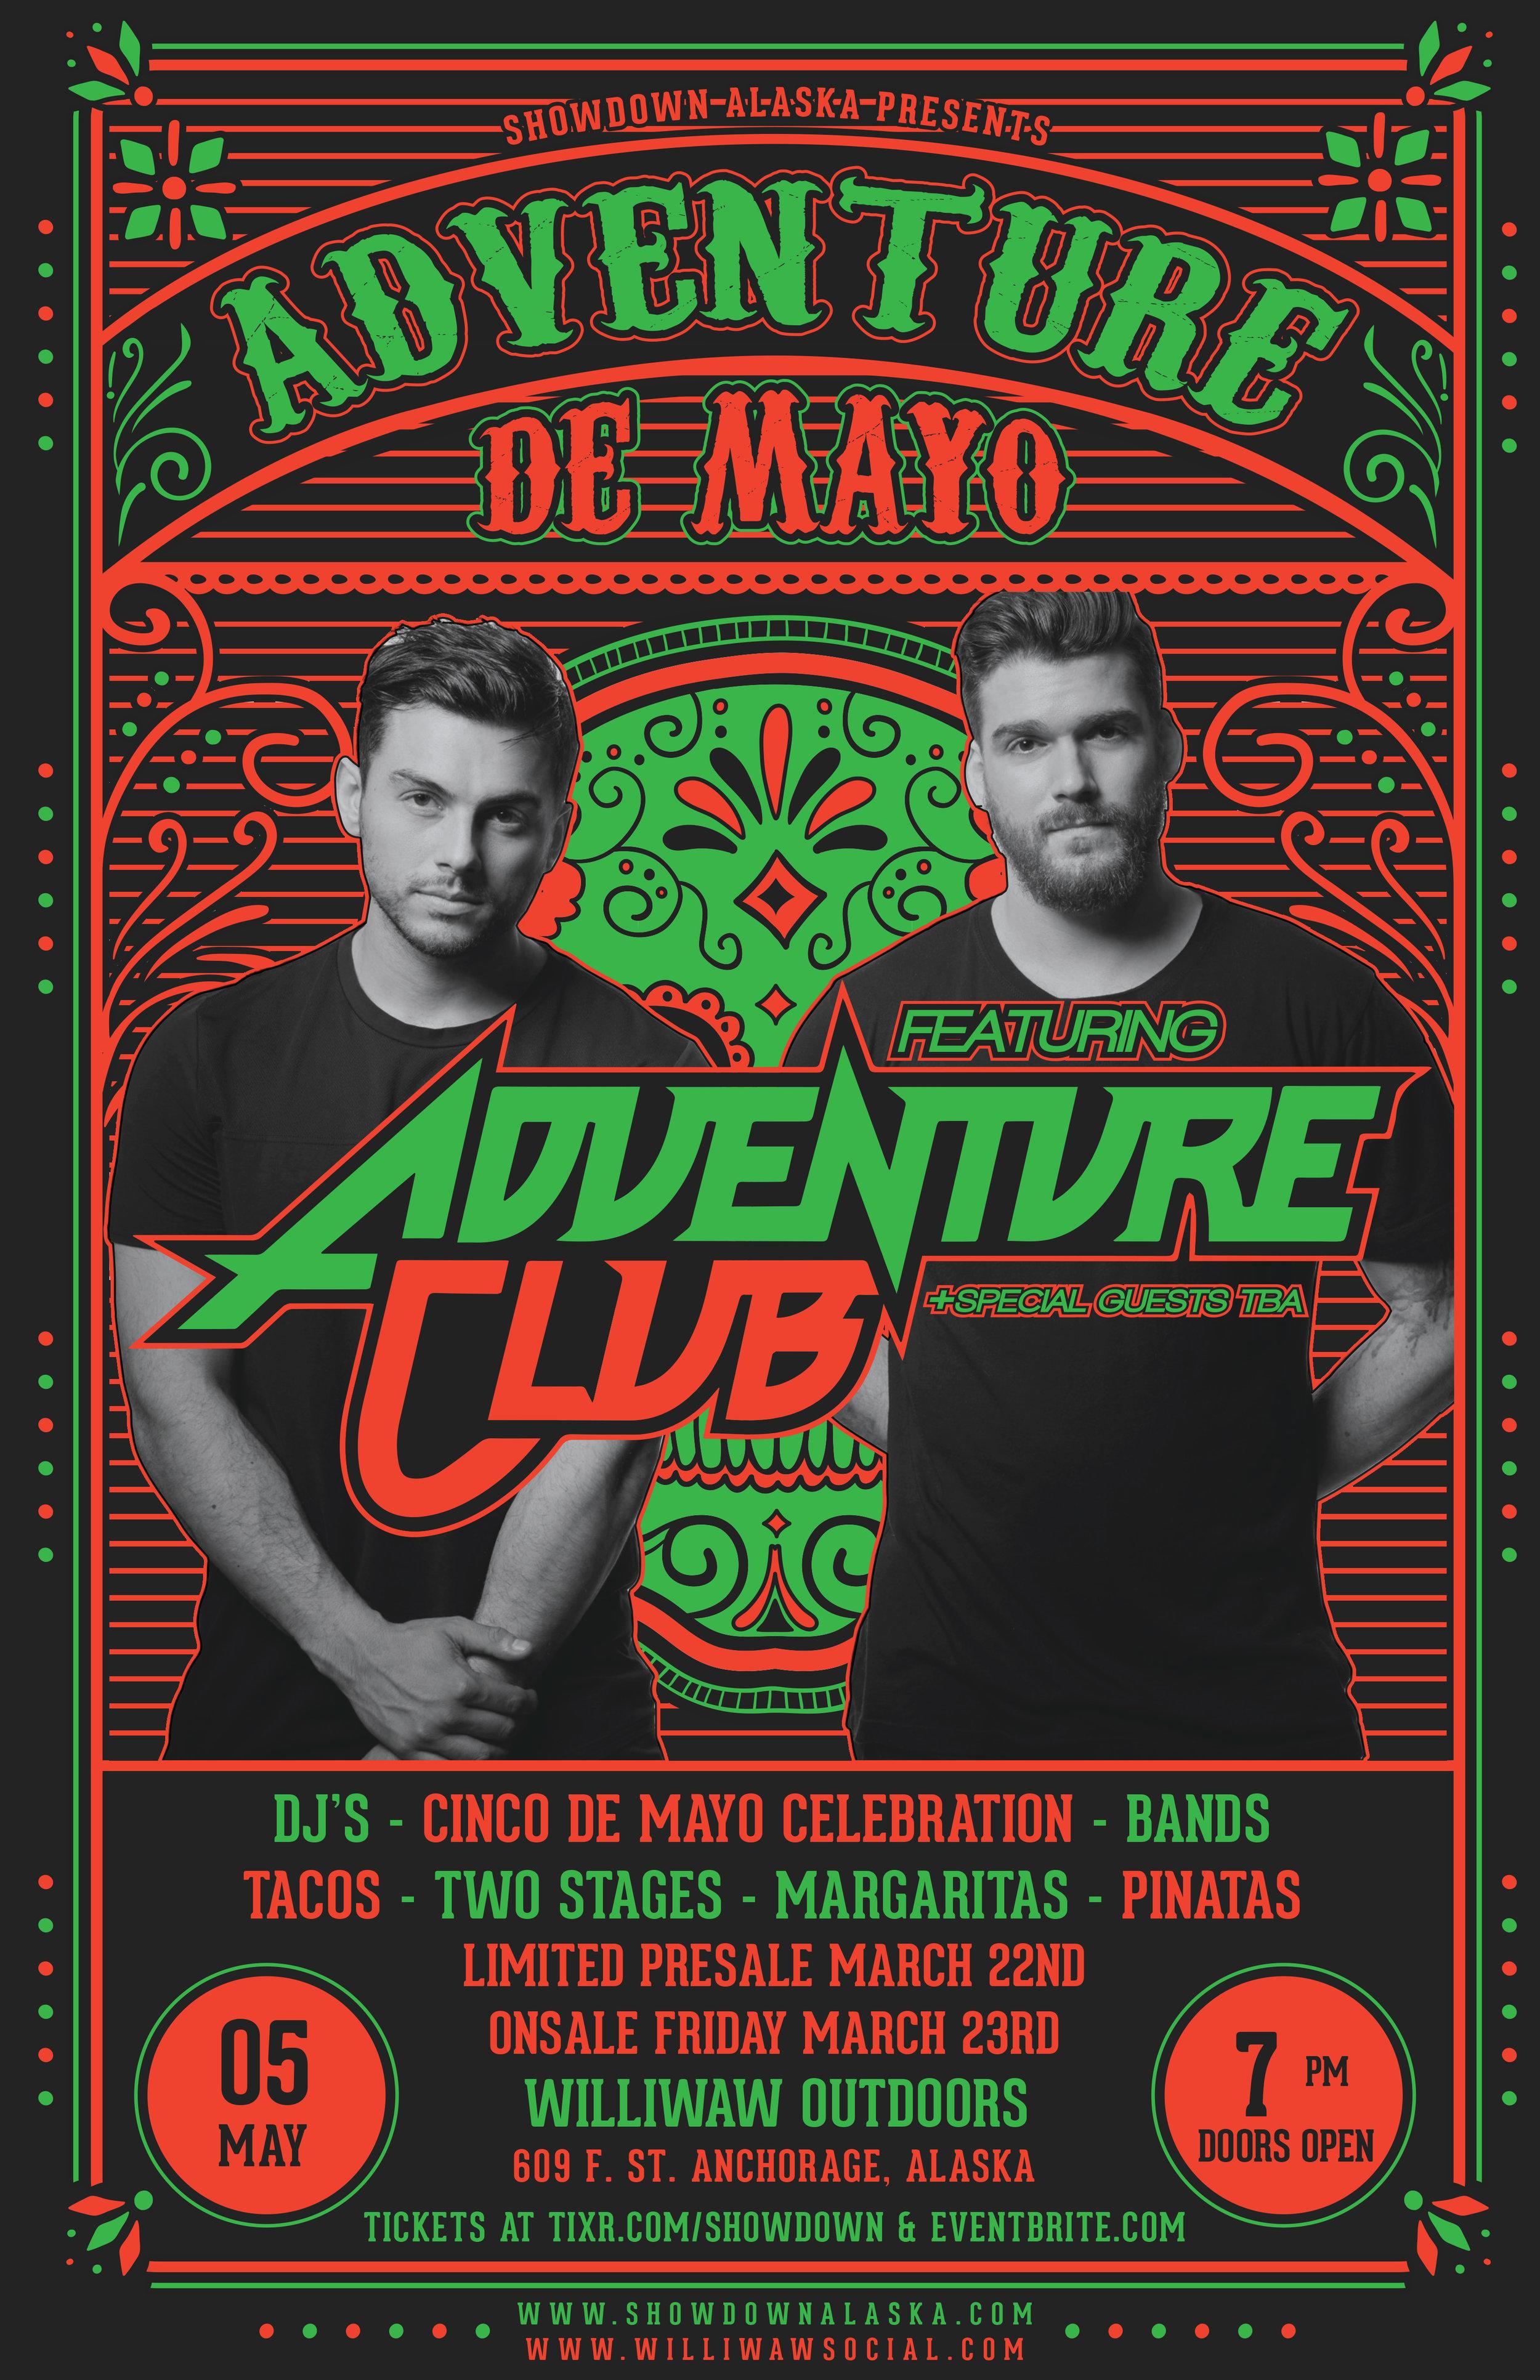 AdventureDeMayo_Poster.jpg